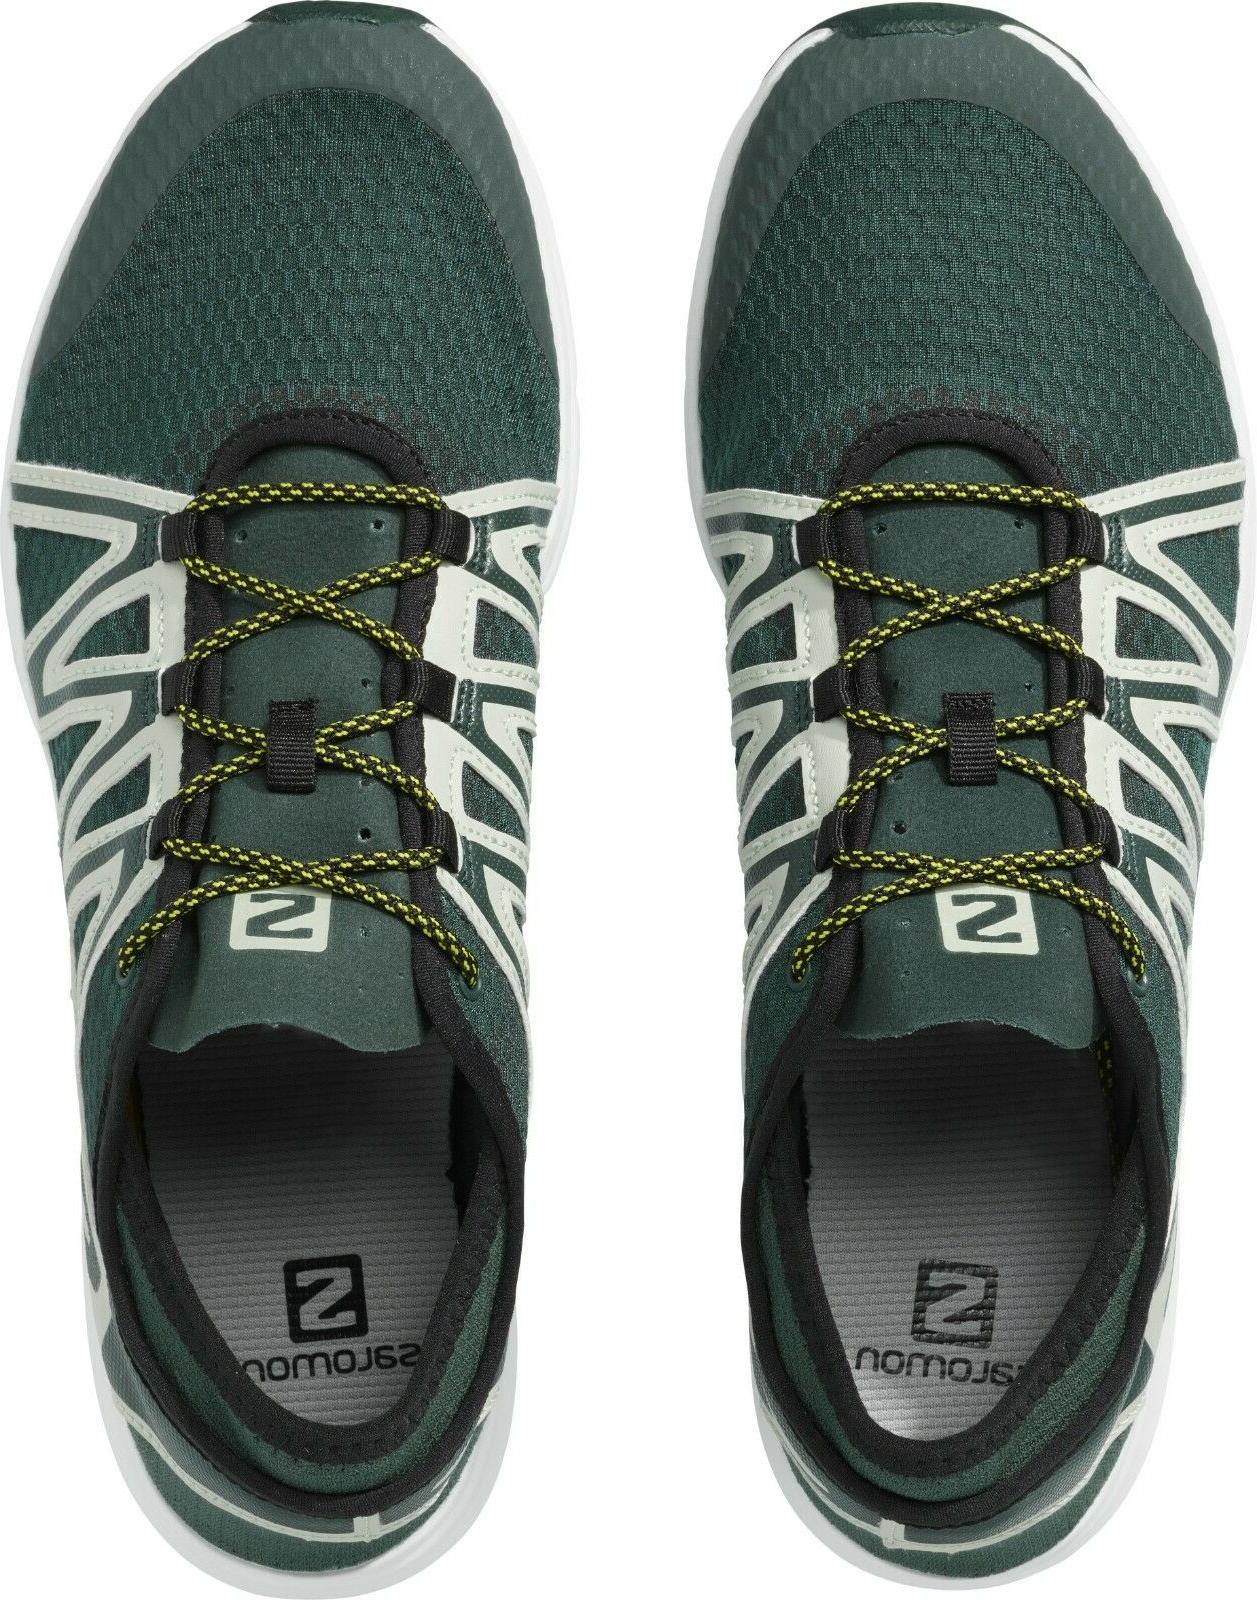 Salomon GENUINE Mns Shoes CROSSAMPHIBIAN SWIFT 2 9US